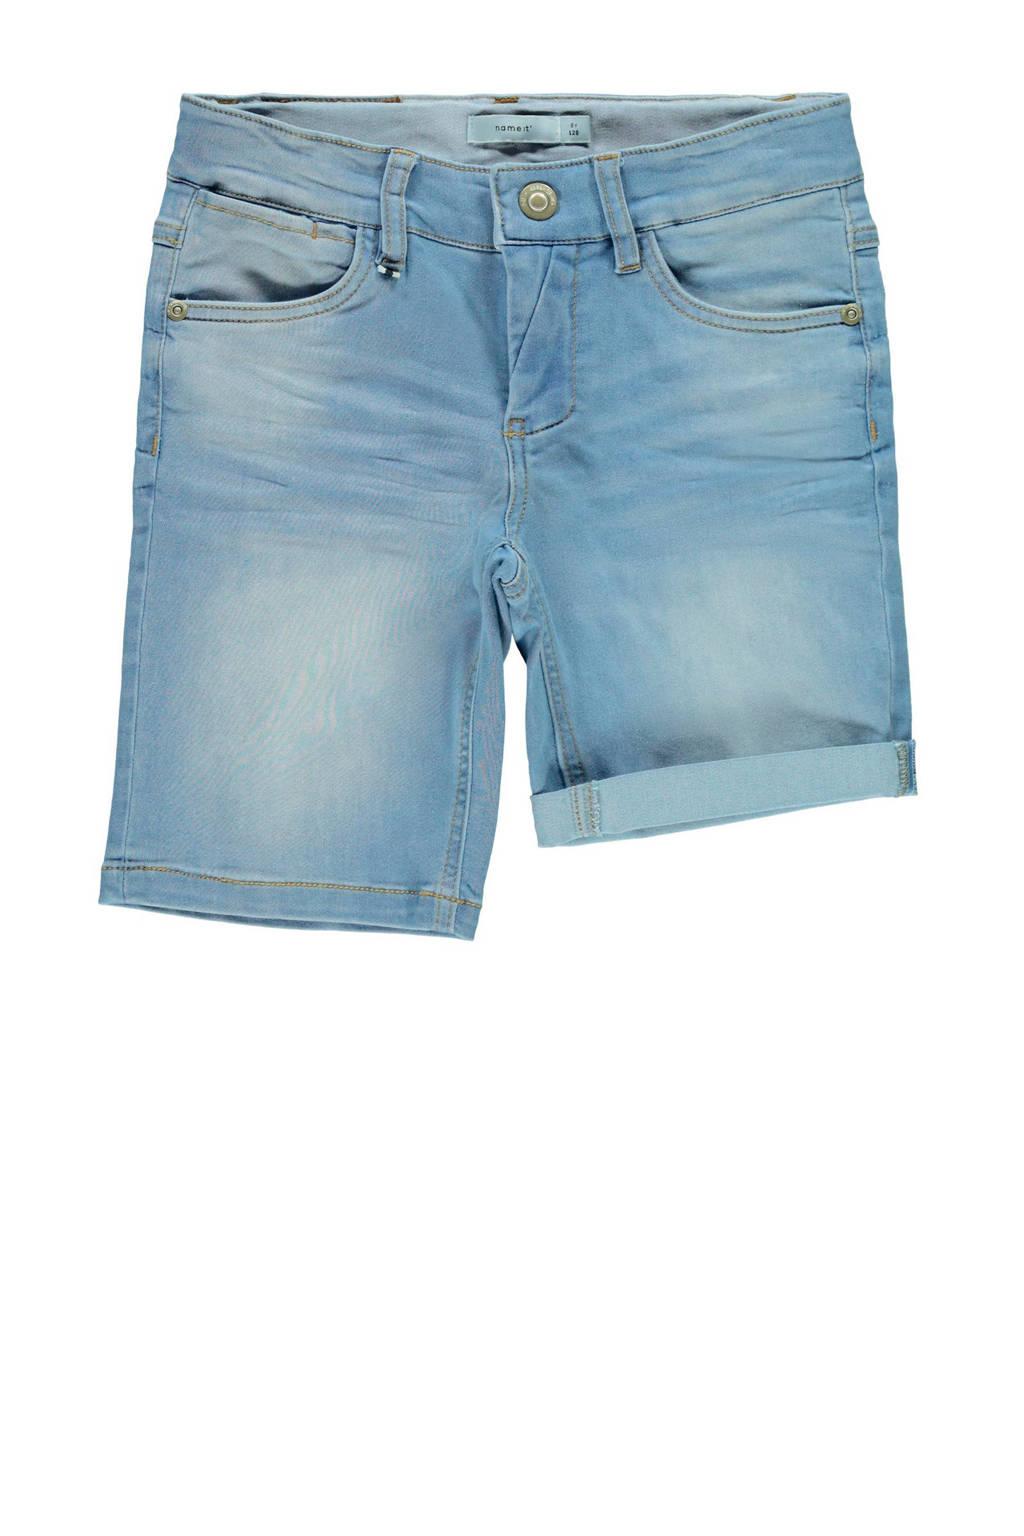 NAME IT KIDS jeans bermuda Theo, Light denim bleached